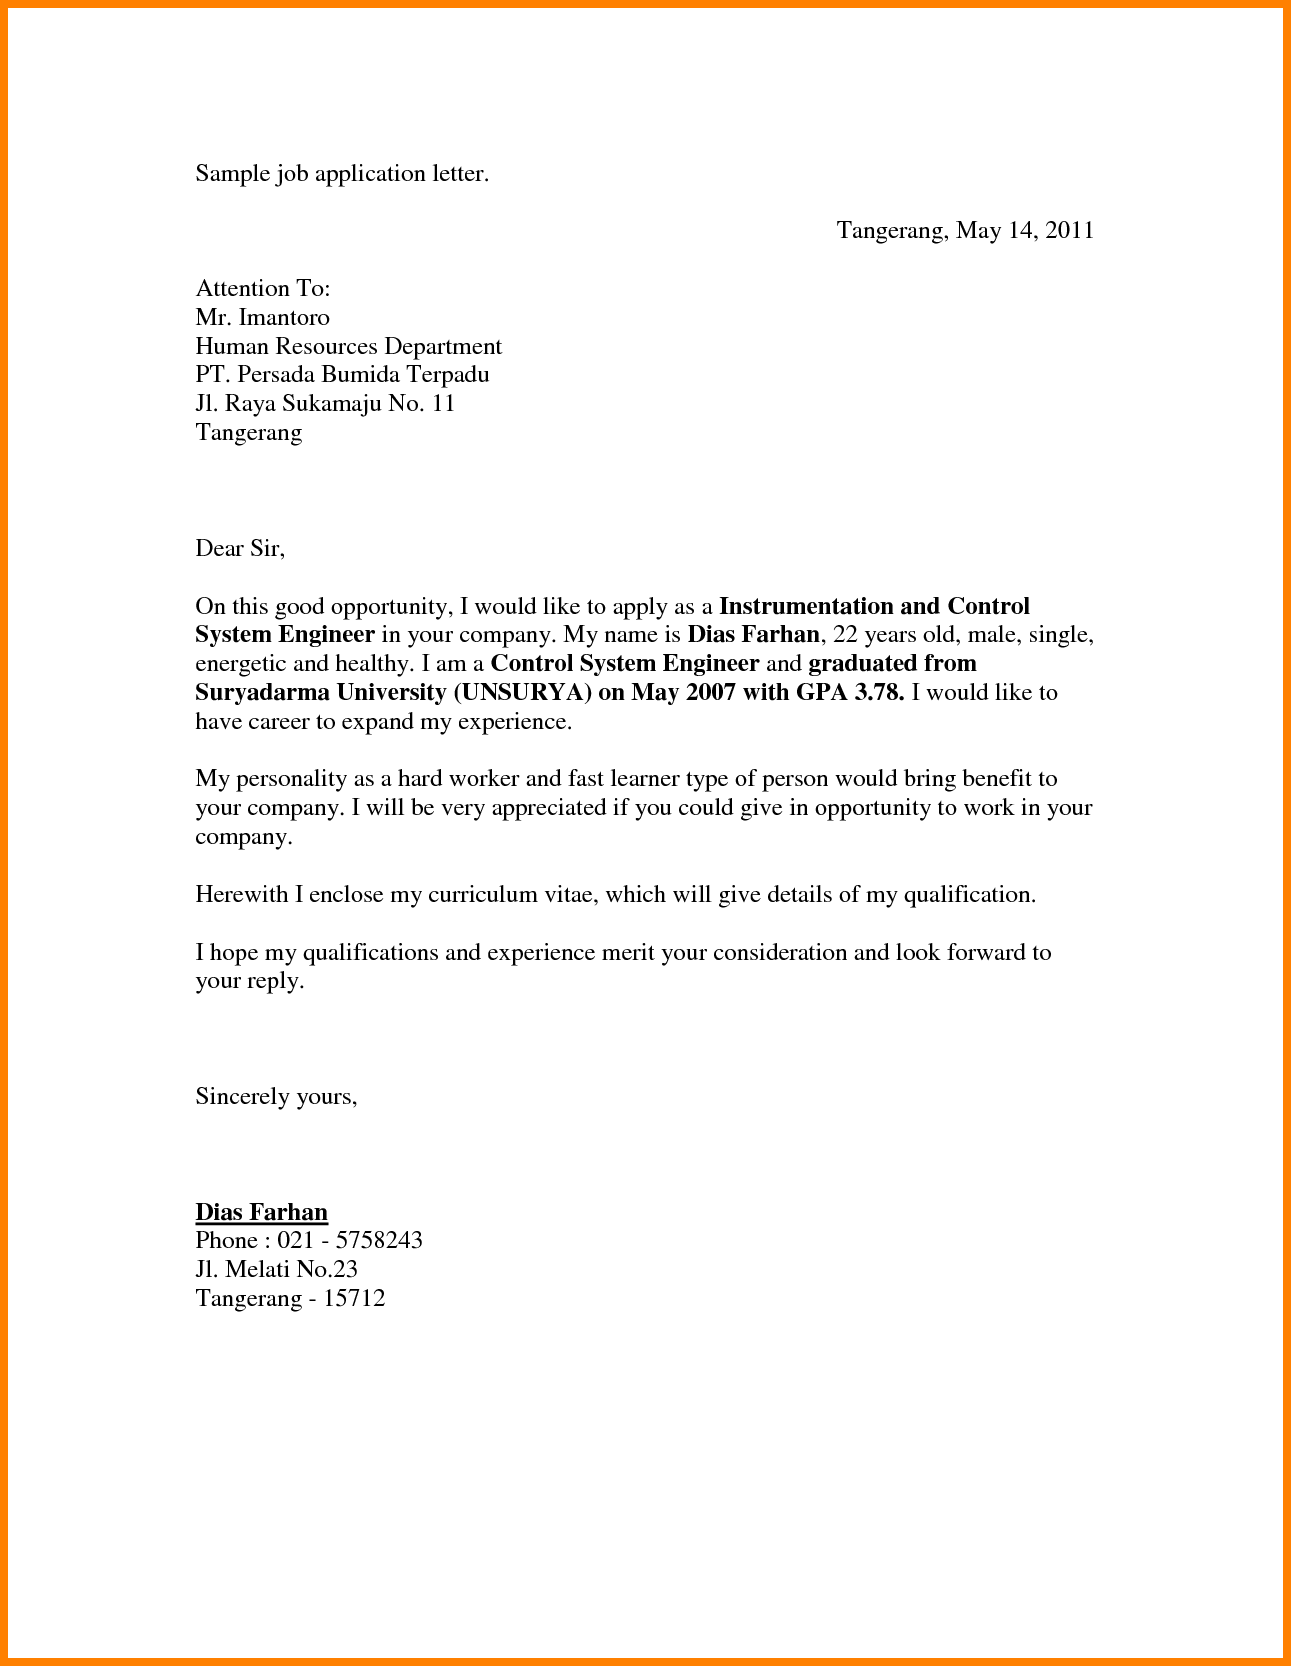 Sample job application letter by dedew93 Application